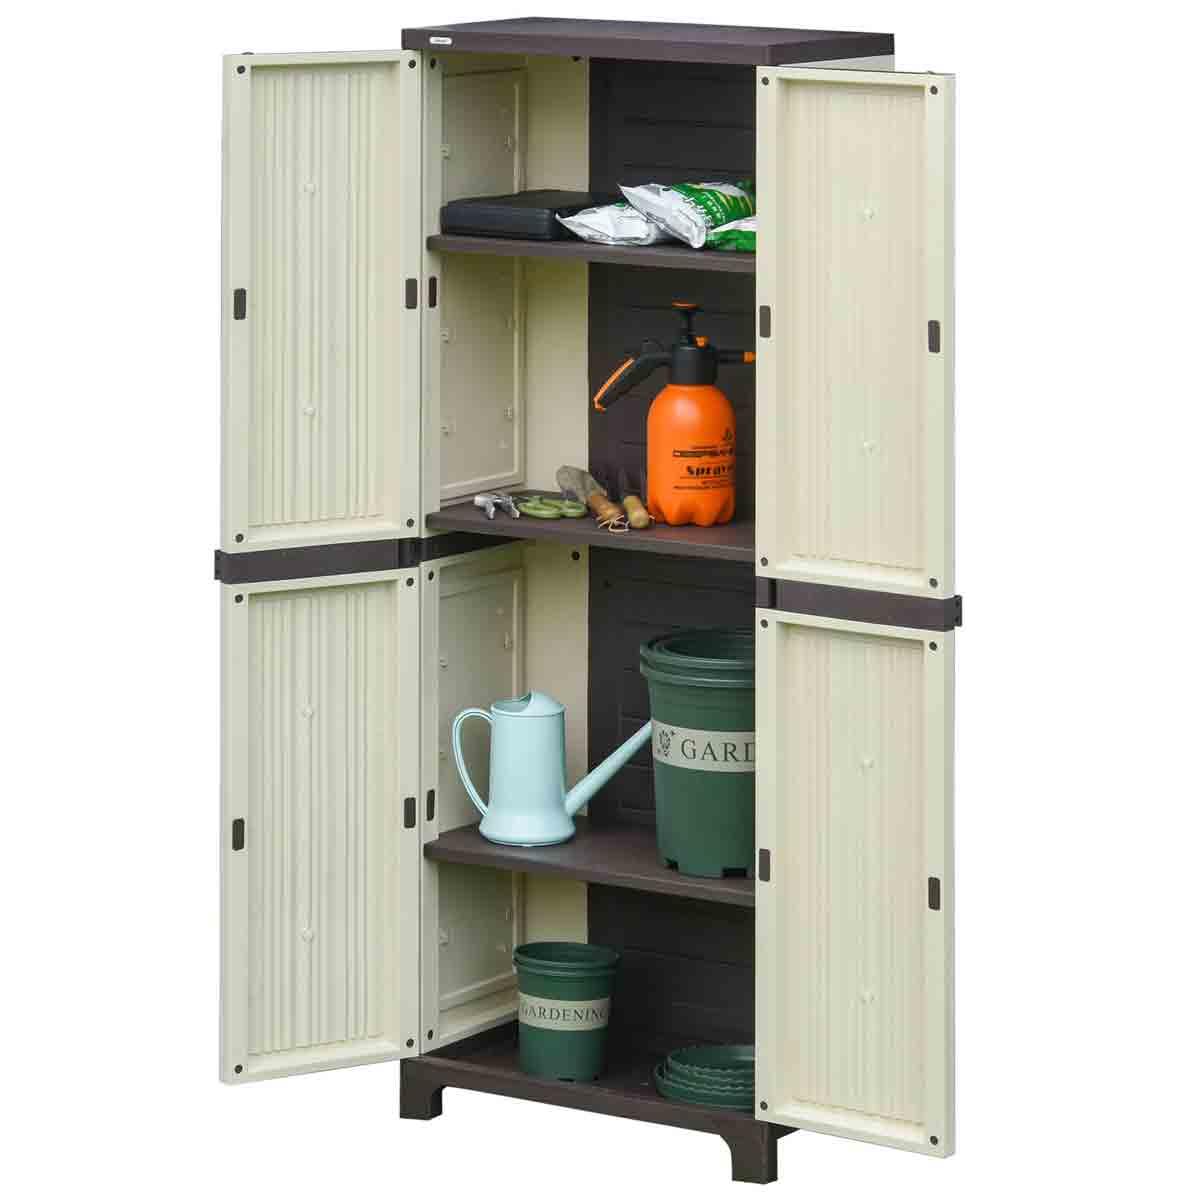 Outsunny 2' 1'' x 1' 2'' Plastic Garden Double Door Storage Cabinet - Cream